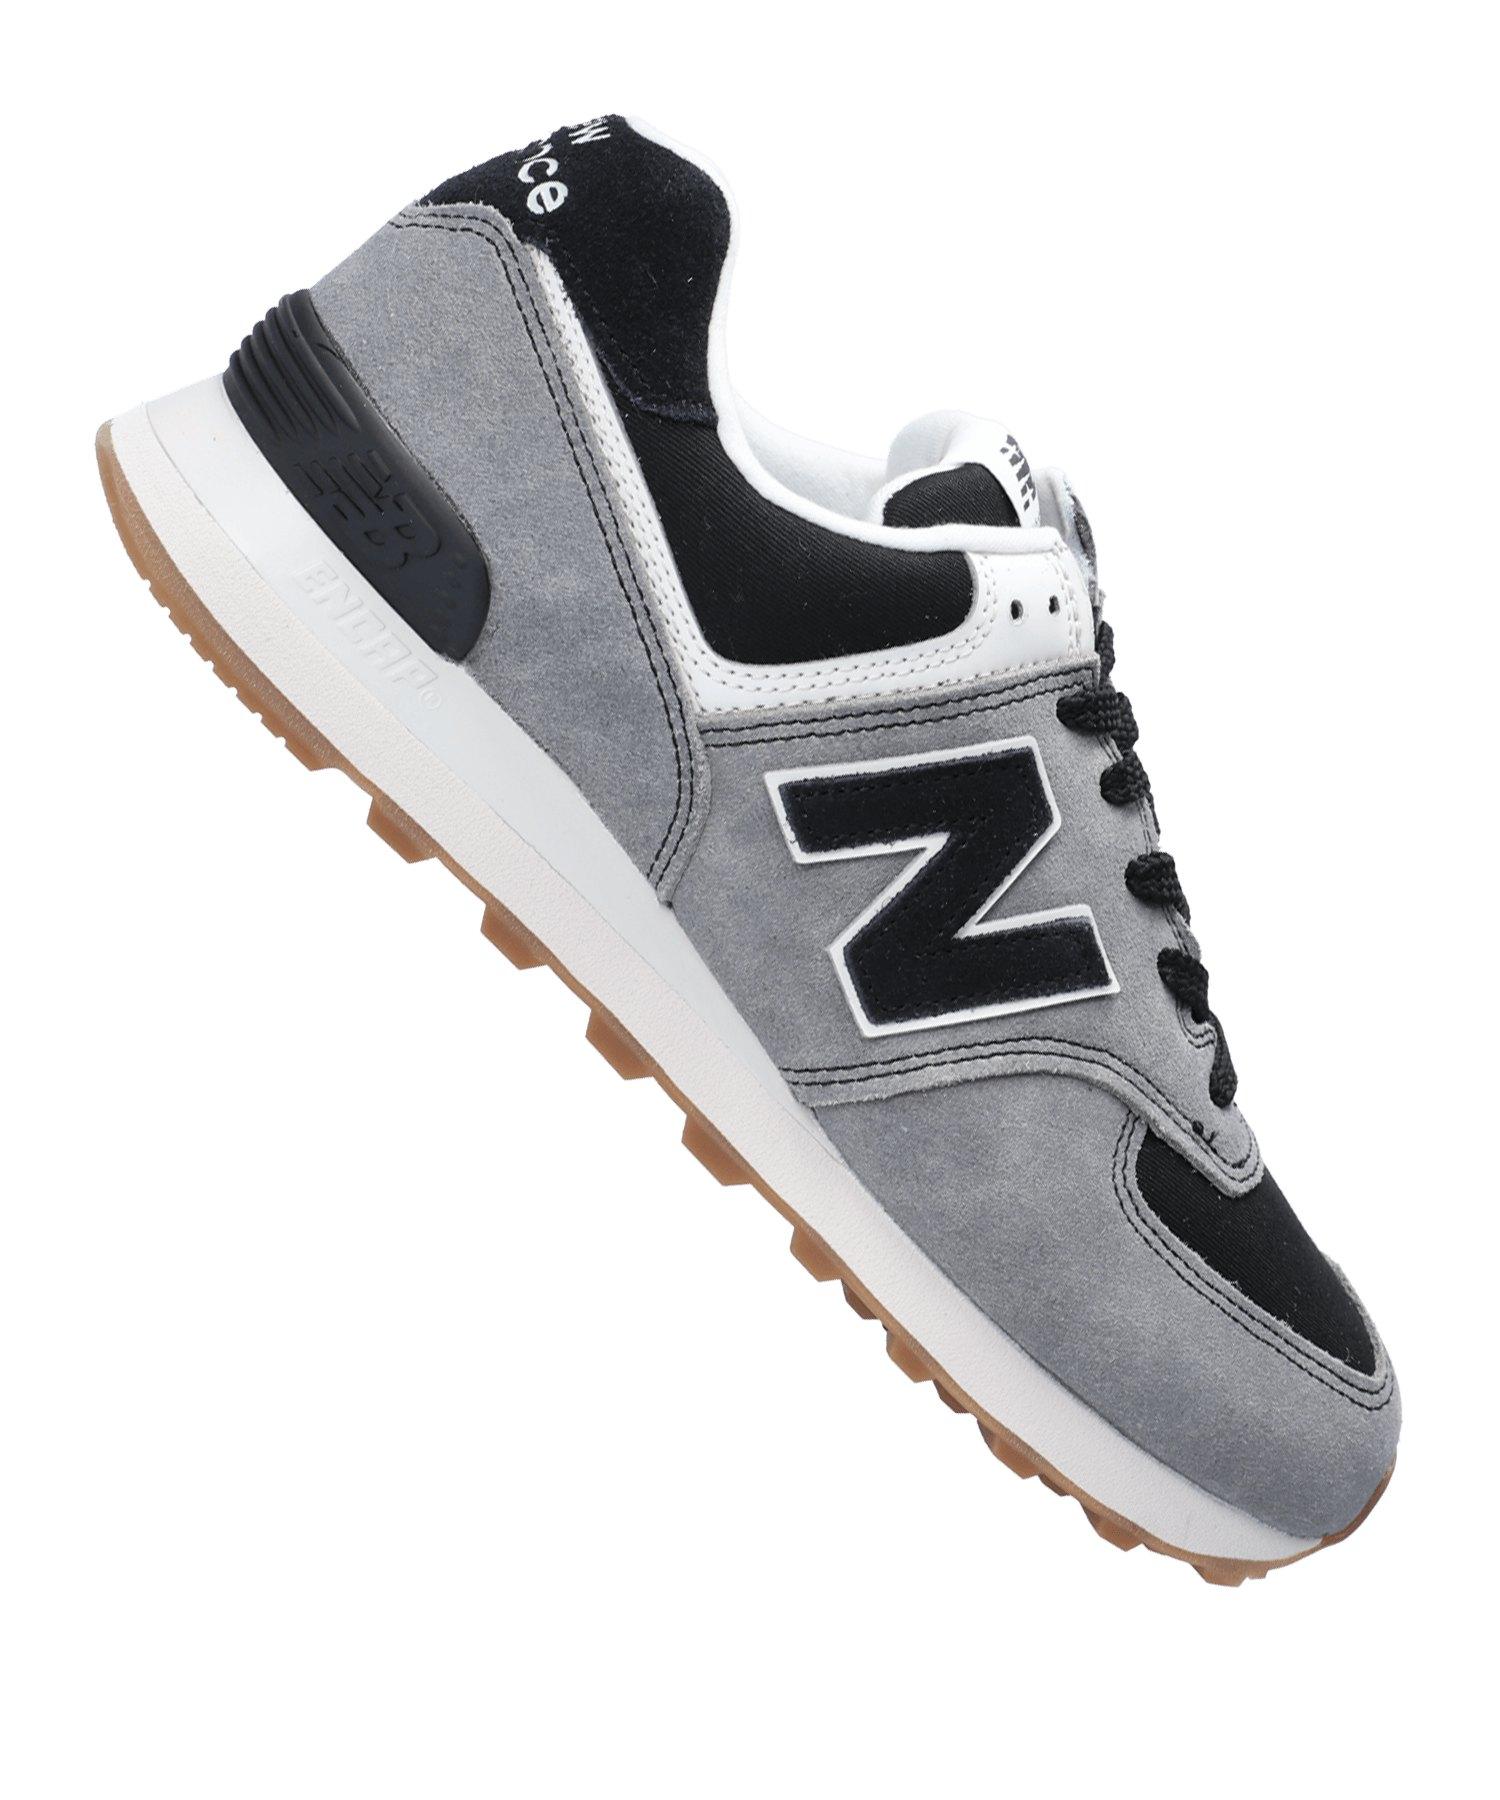 New Balance ML574 D Sneaker Schwarz F8 - schwarz